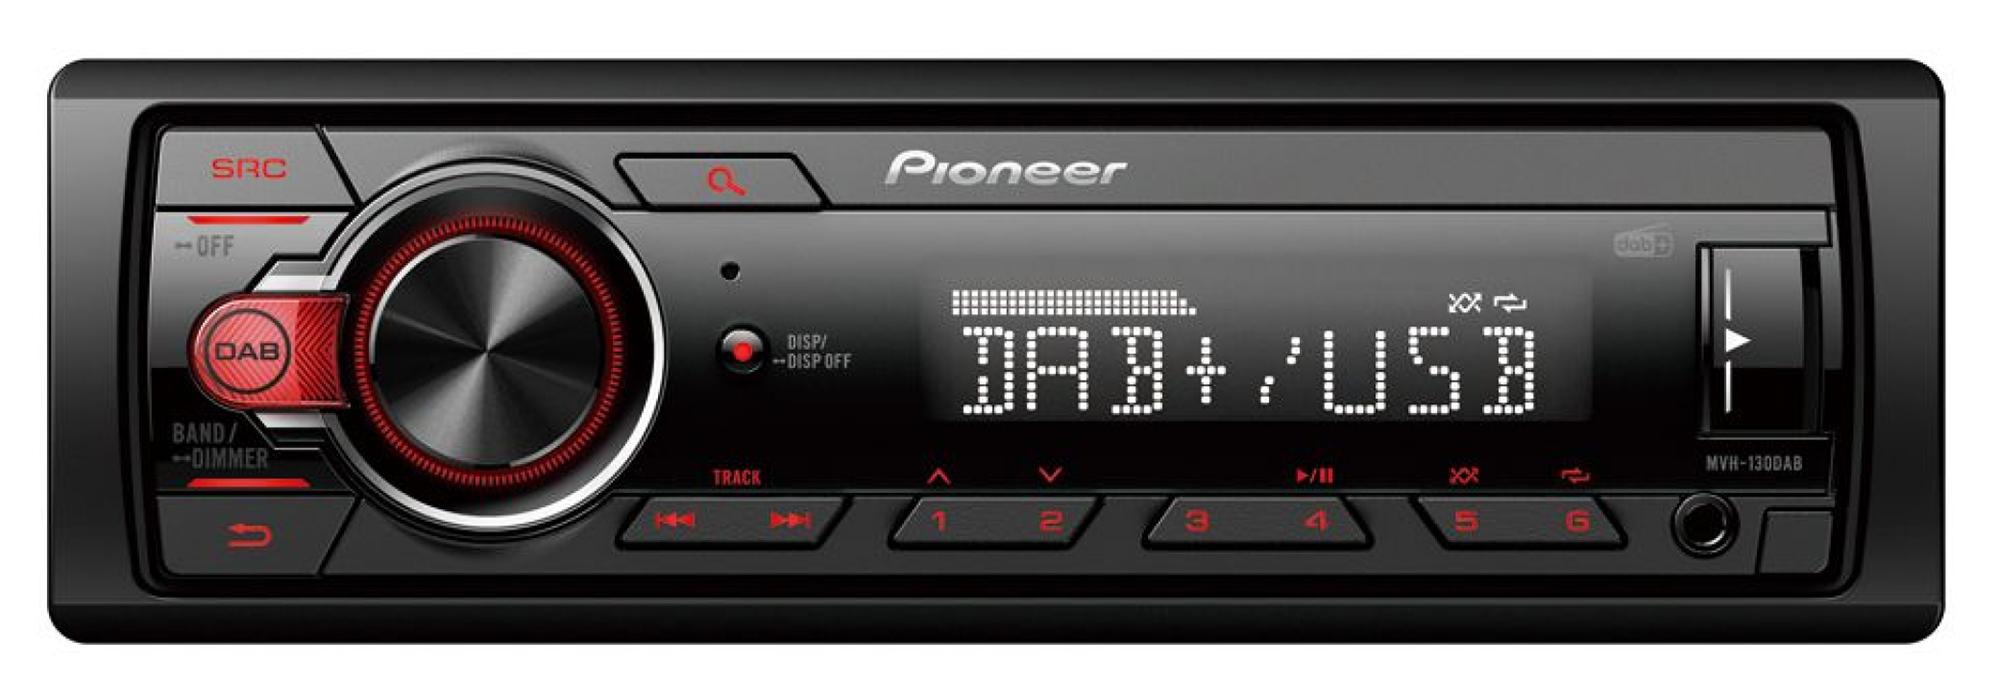 RADIO MVH-130DAB